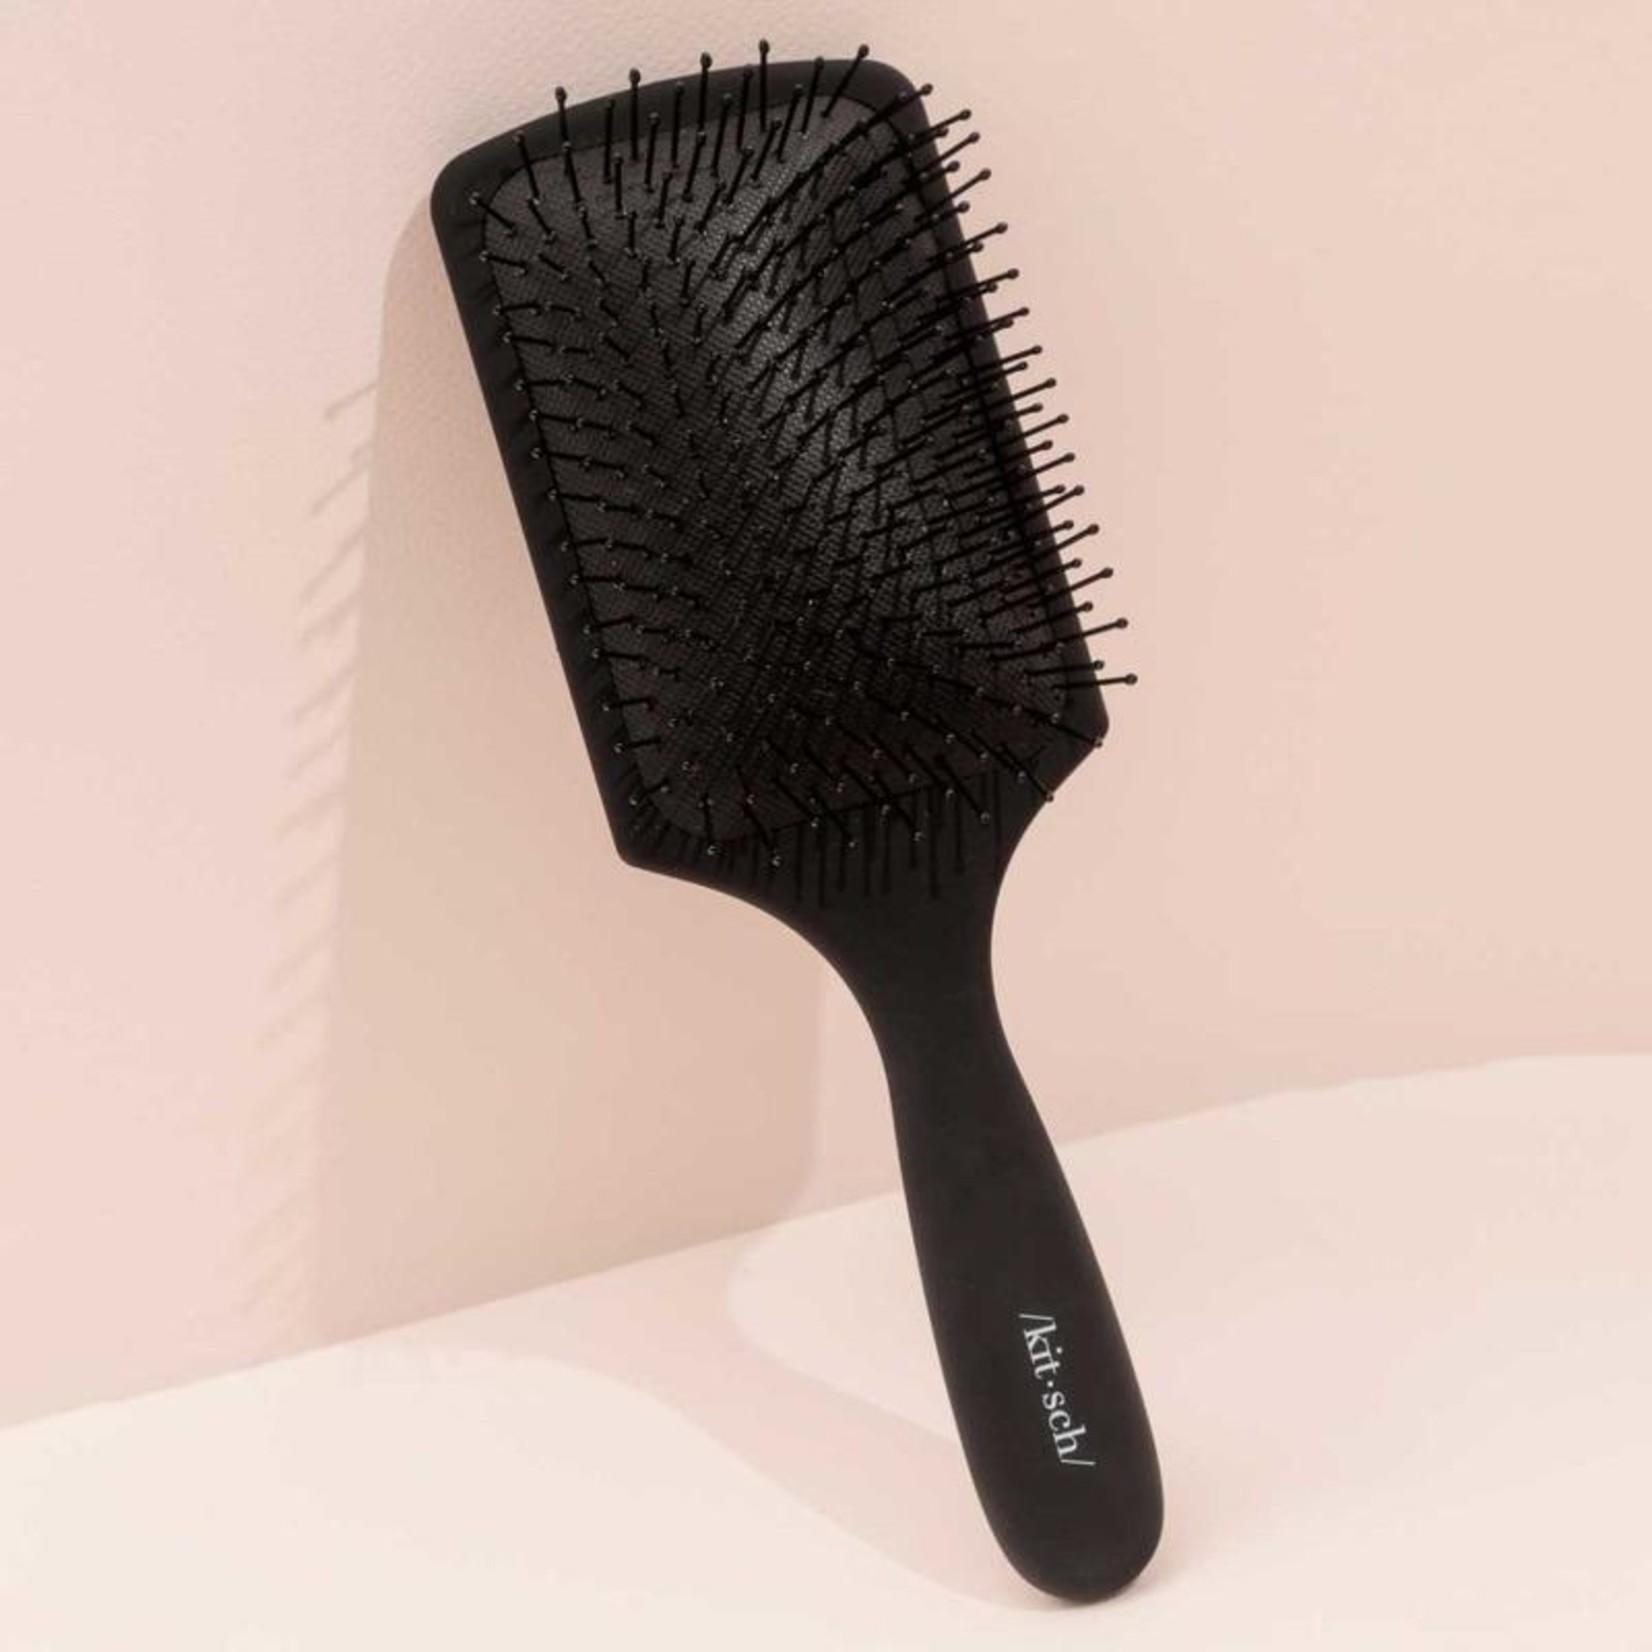 /KIT•SCH/ Eco-Friendly Paddle Brush